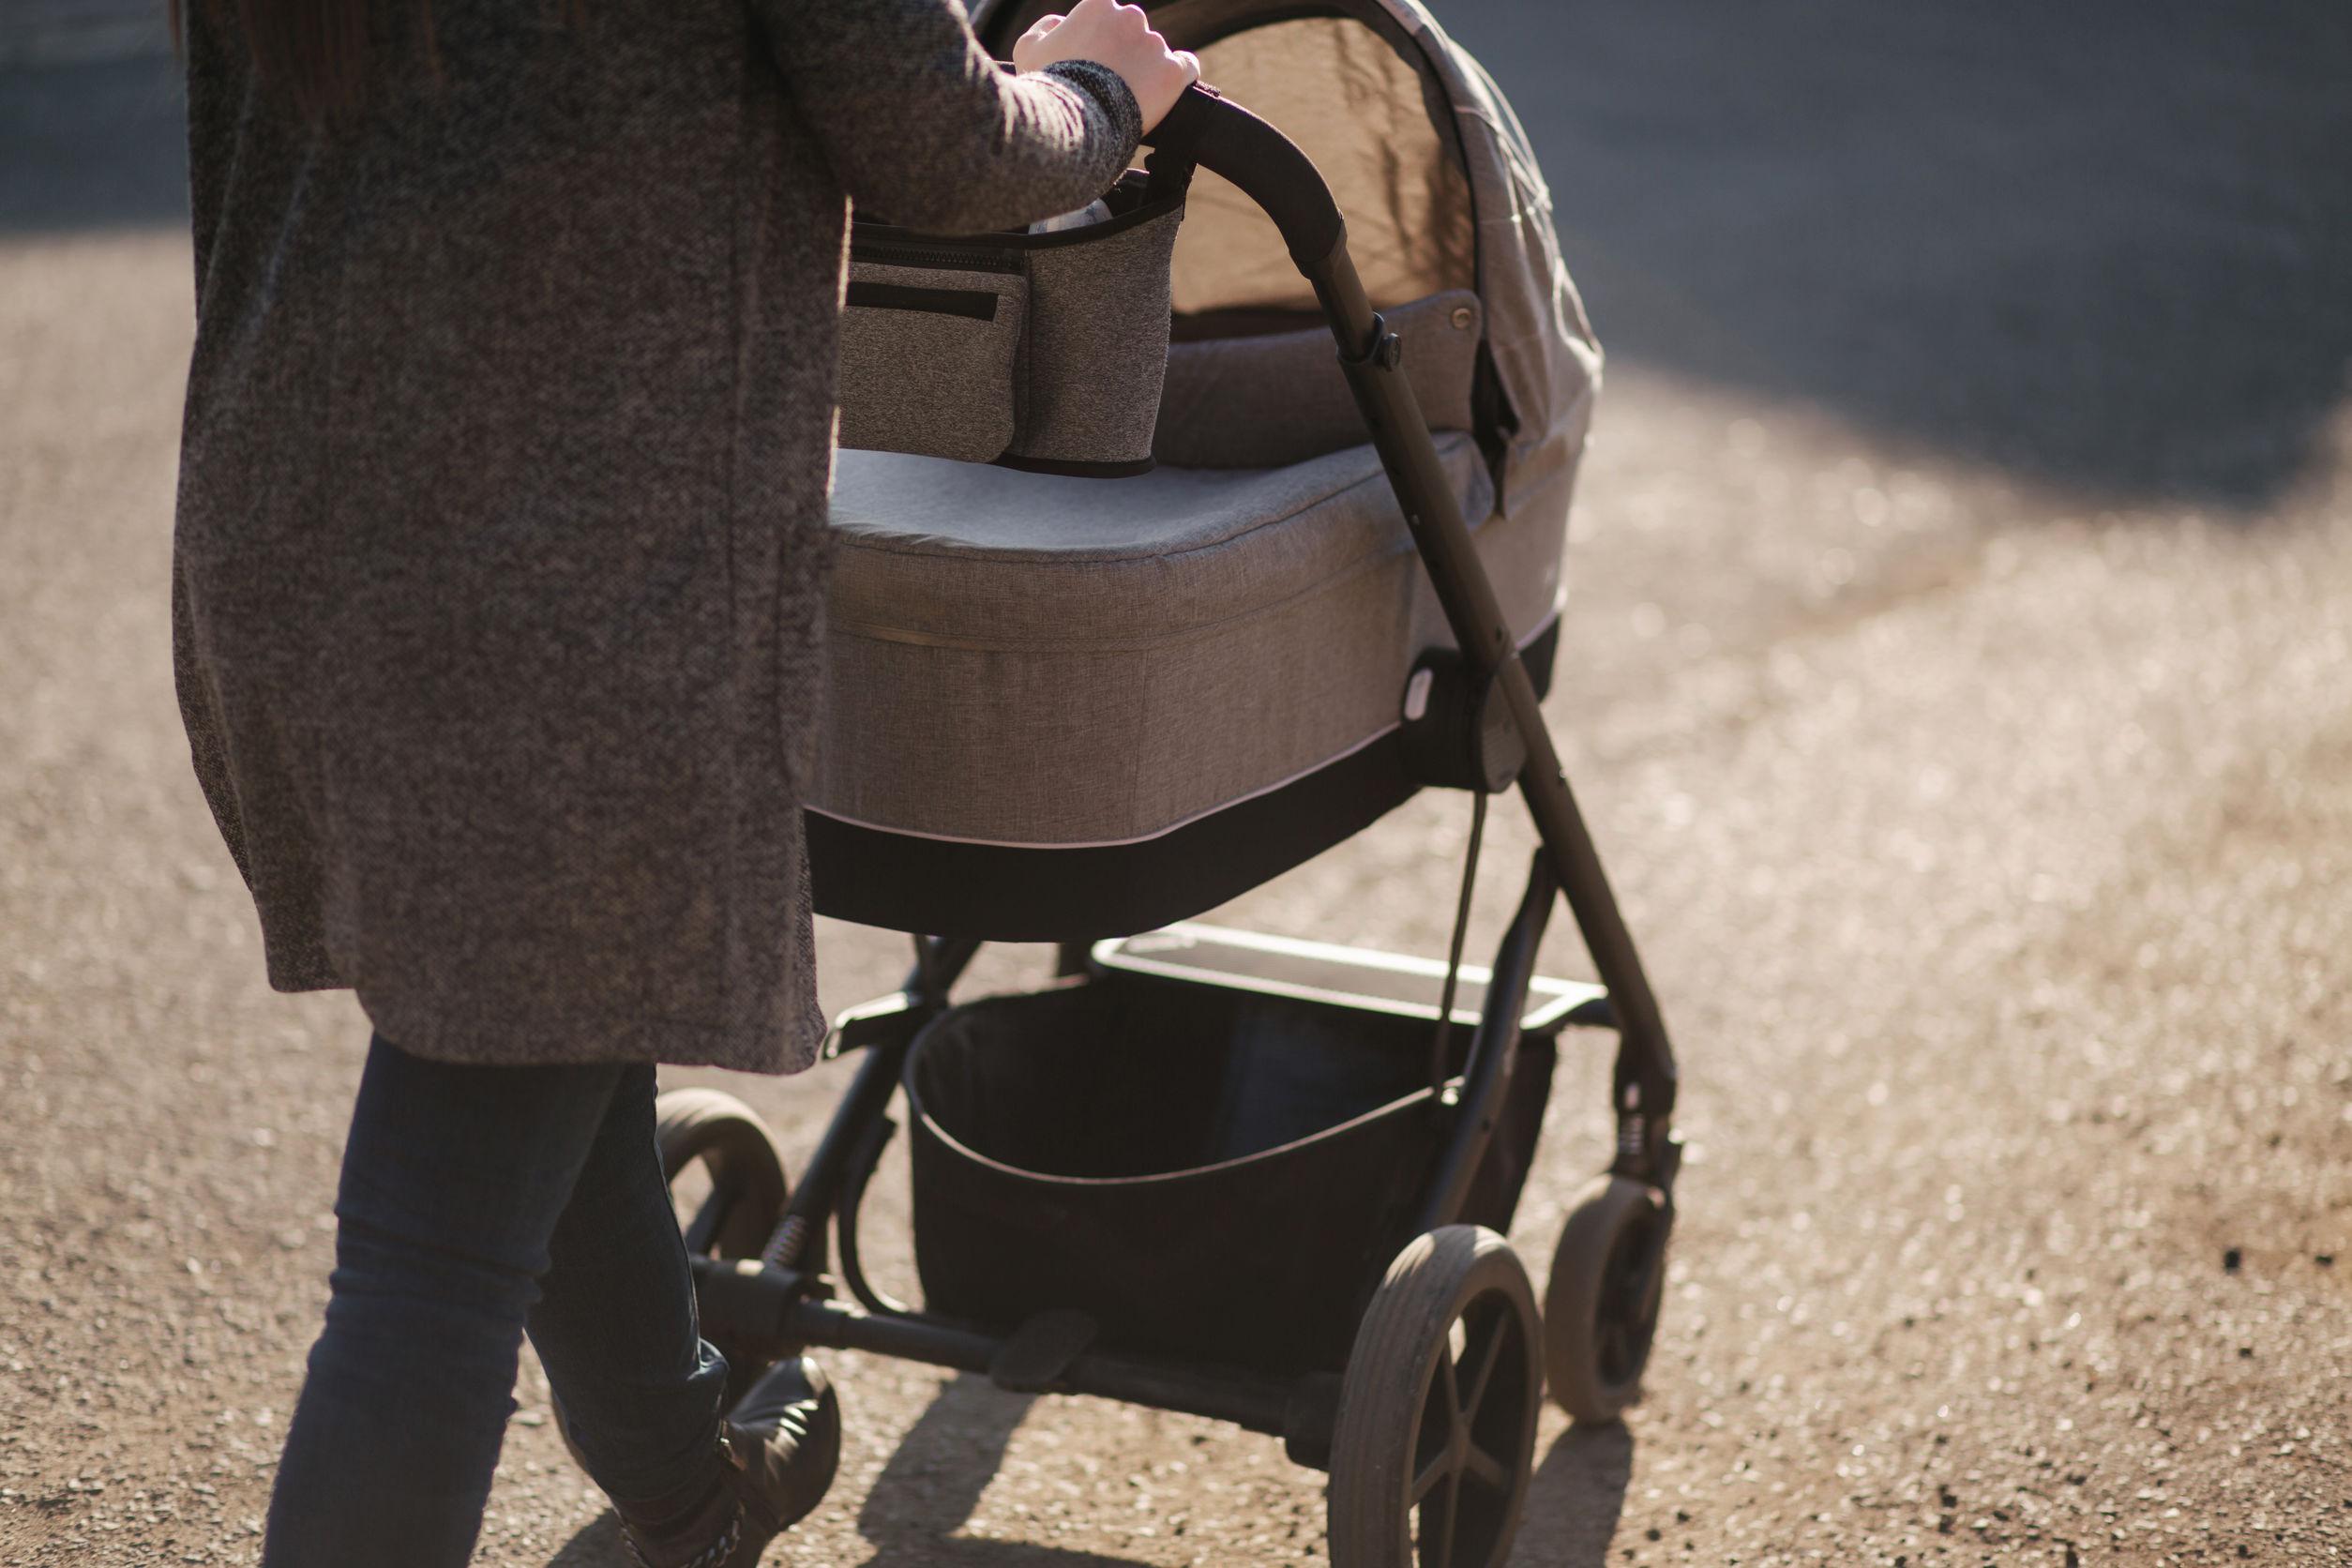 Kinderwagen Fußsack